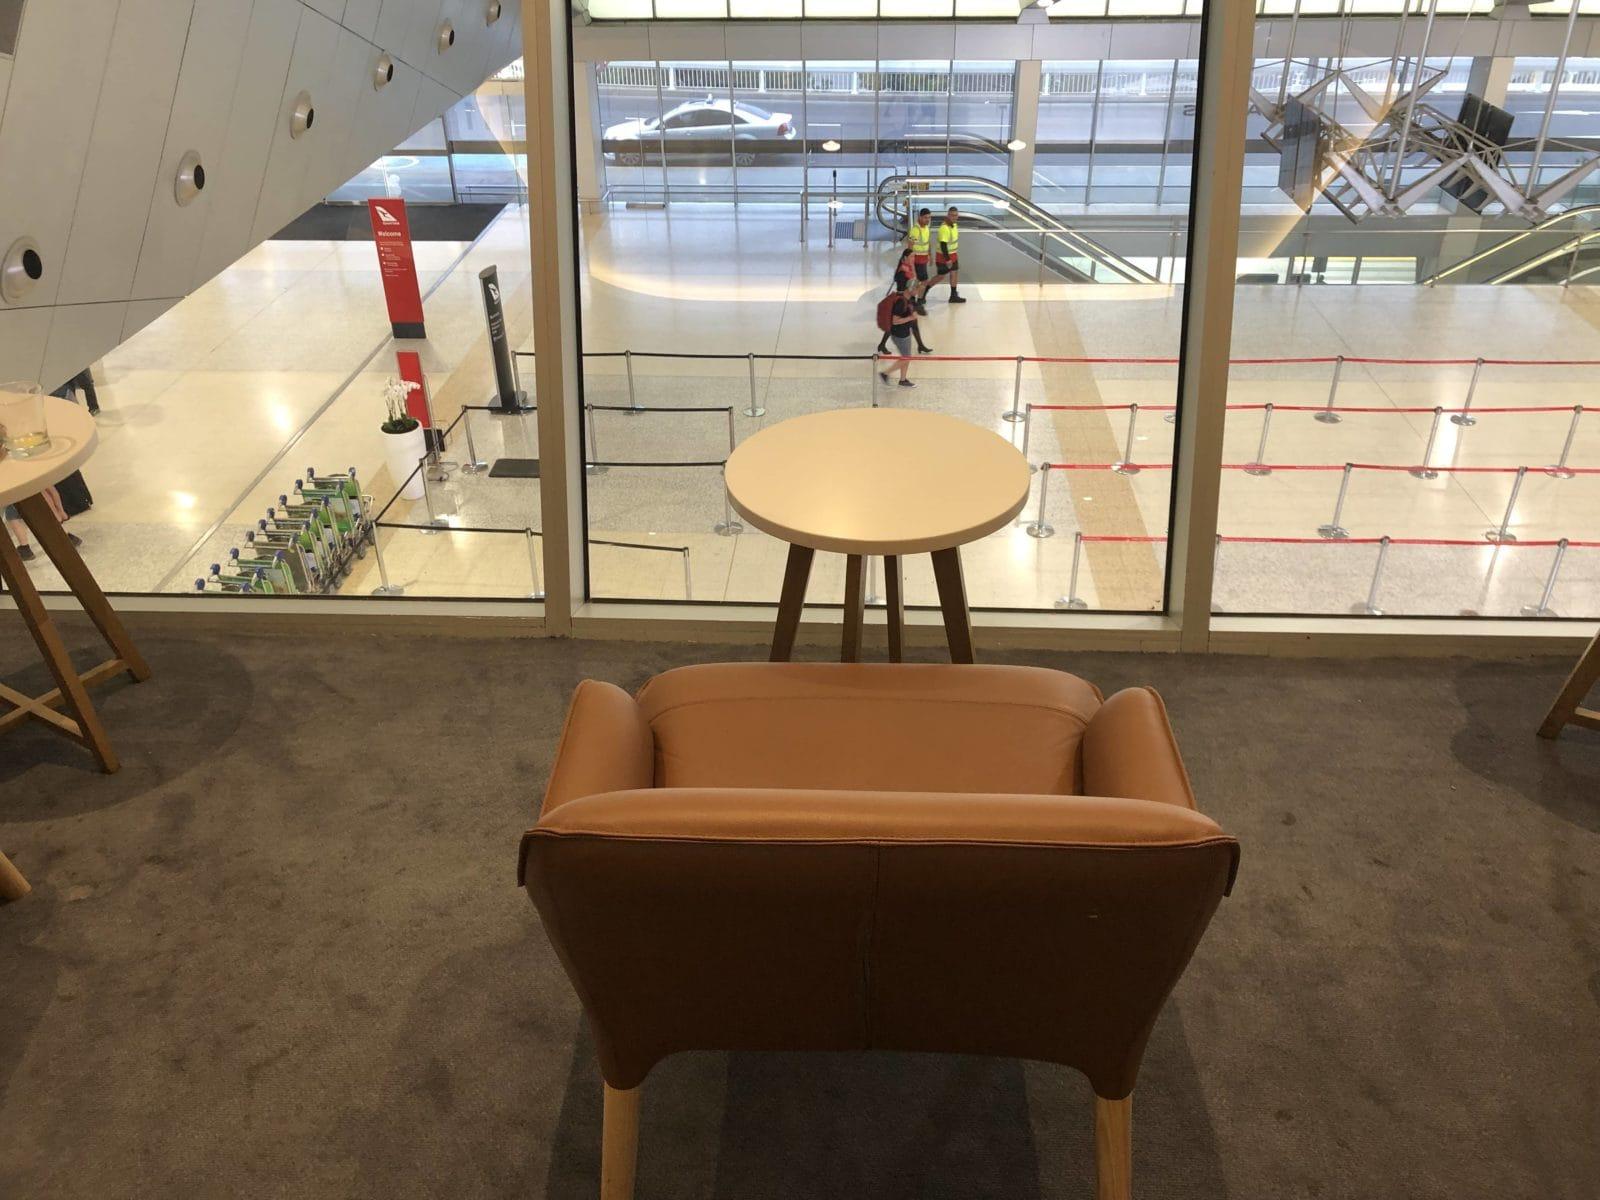 The Qantas Club Melbourne Eingangshalle